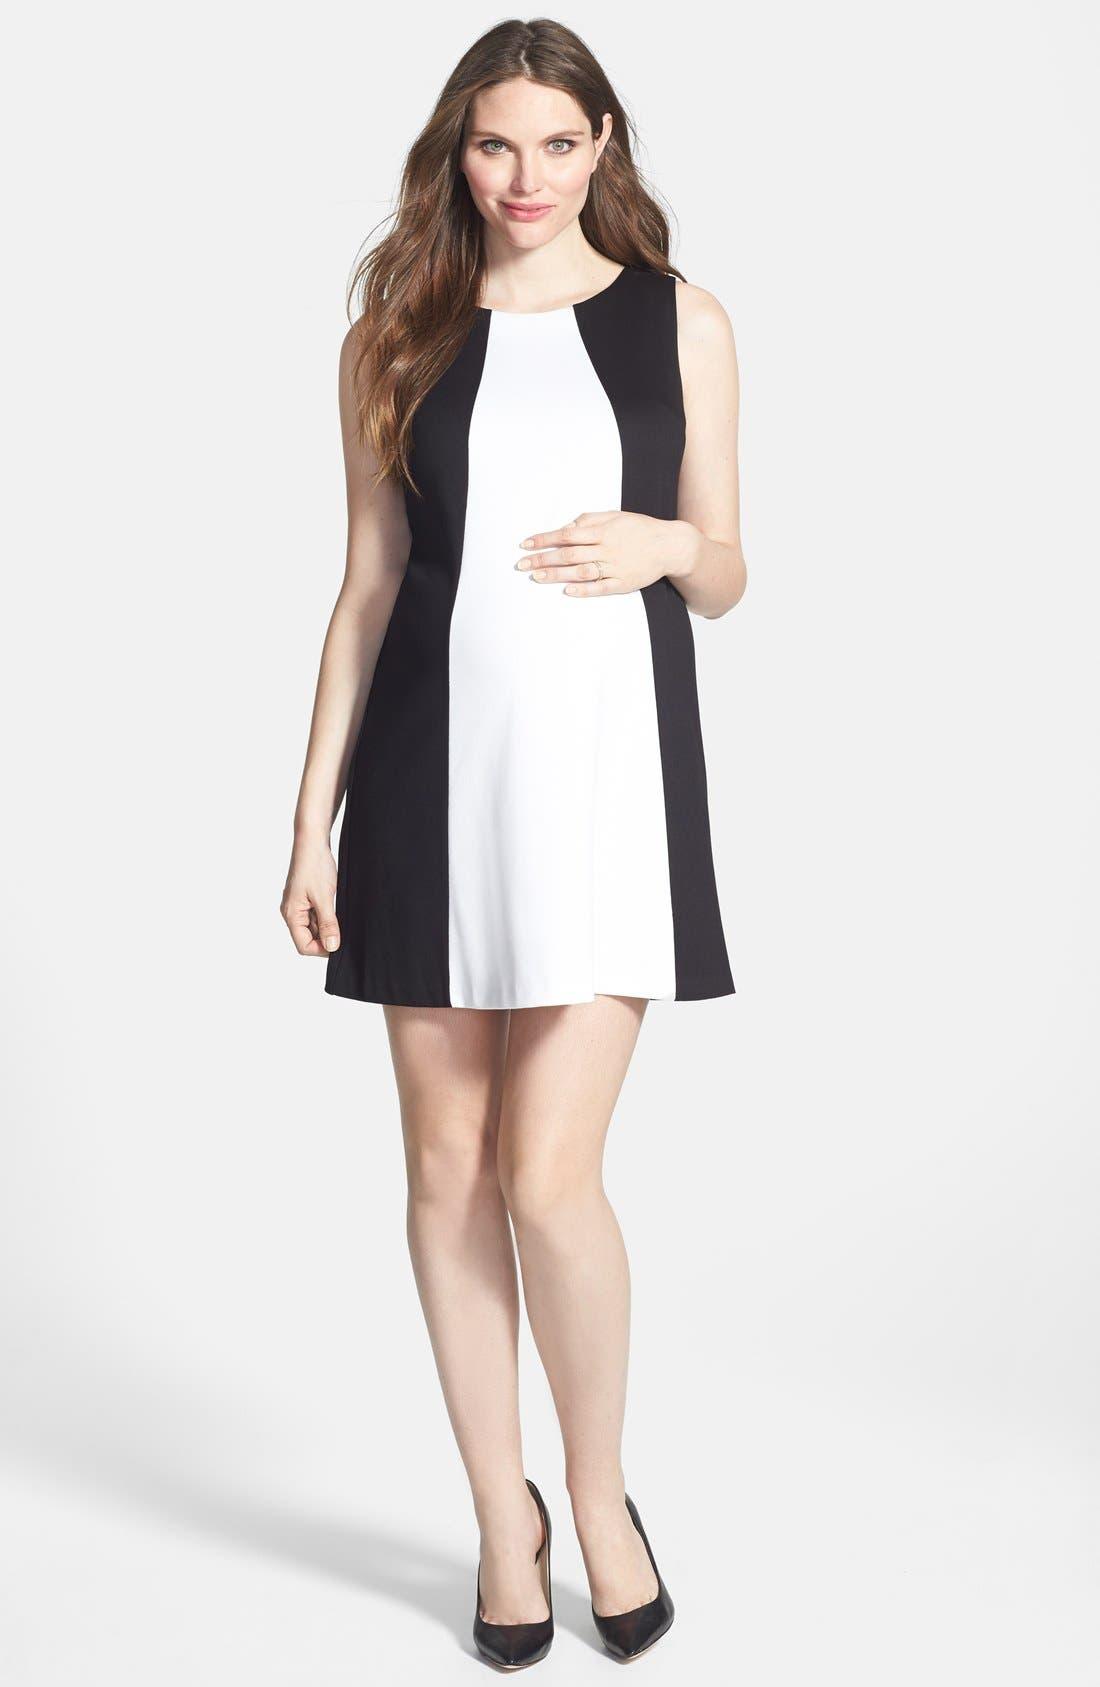 MATERNAL AMERICA 'Pyramid' Maternity Dress